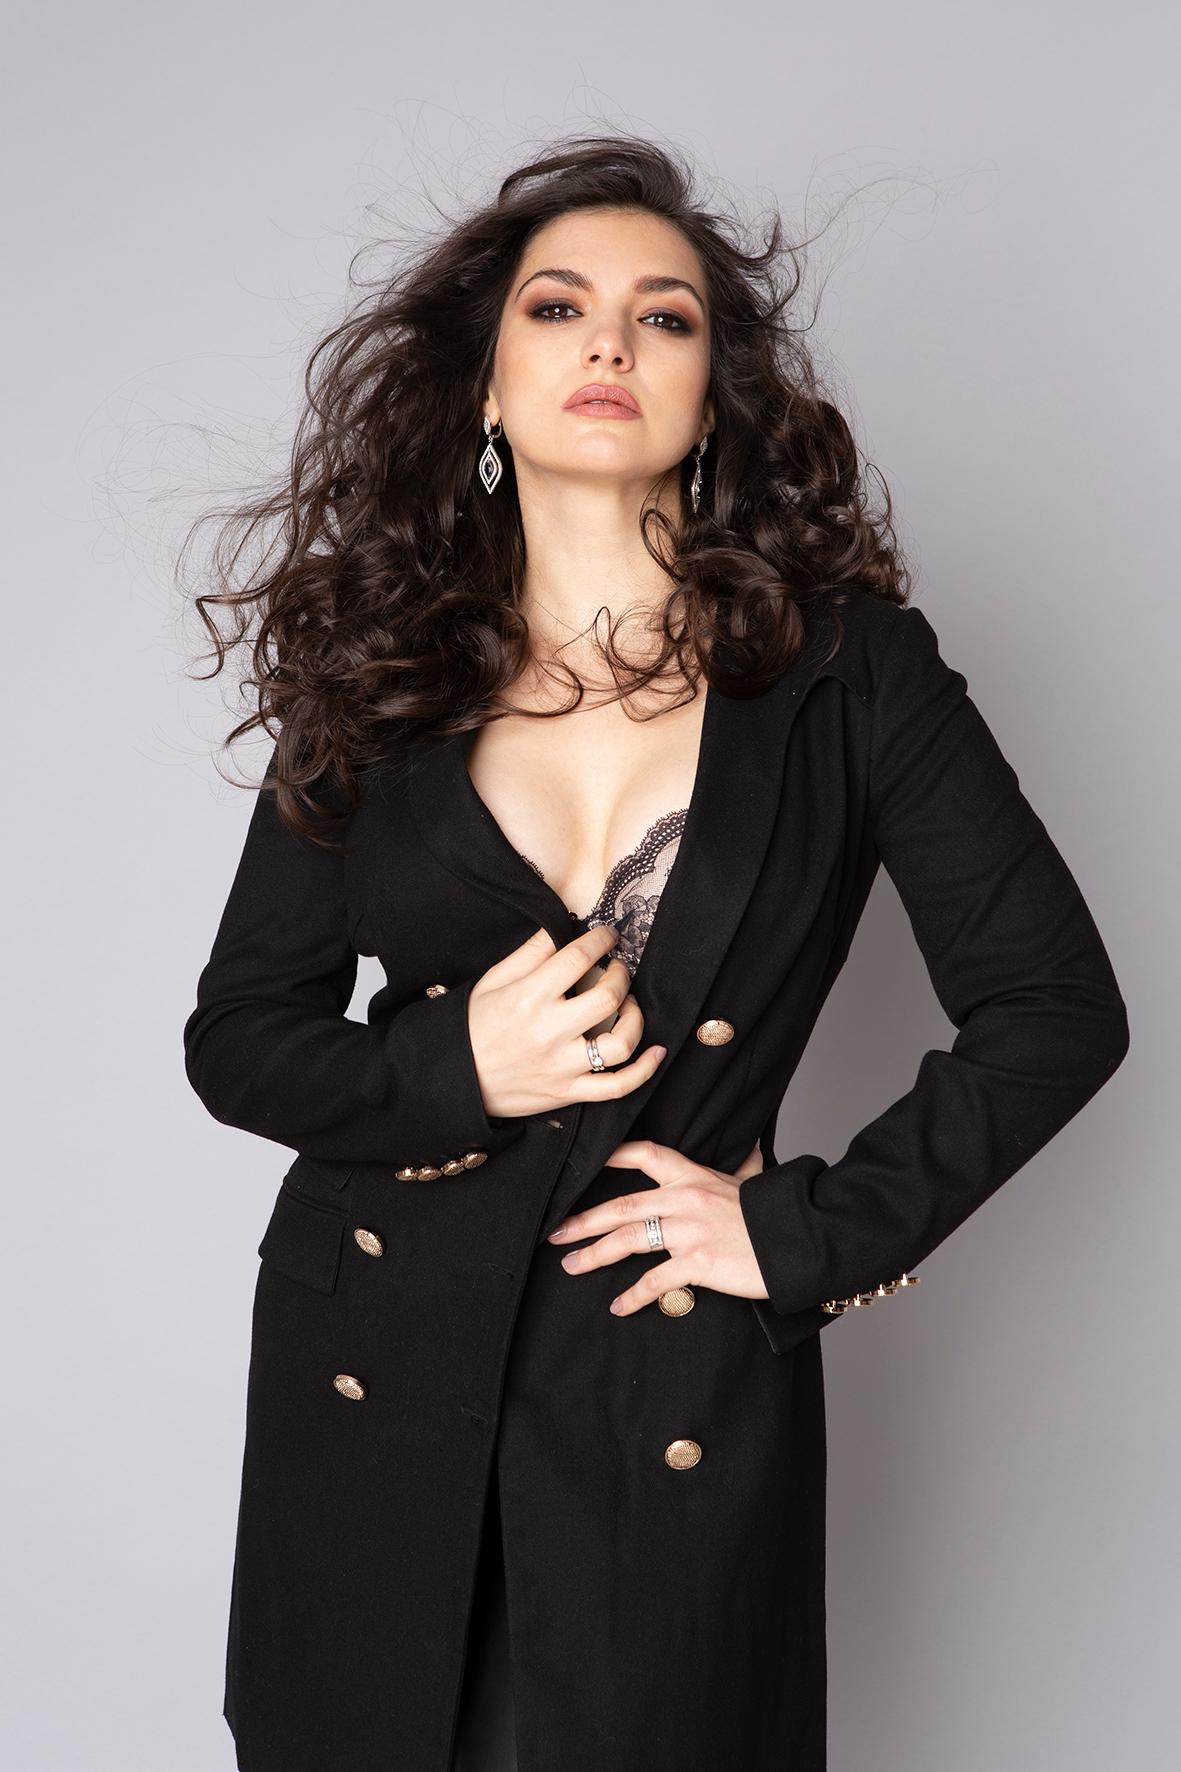 Lena Belkina - Picture nr #5